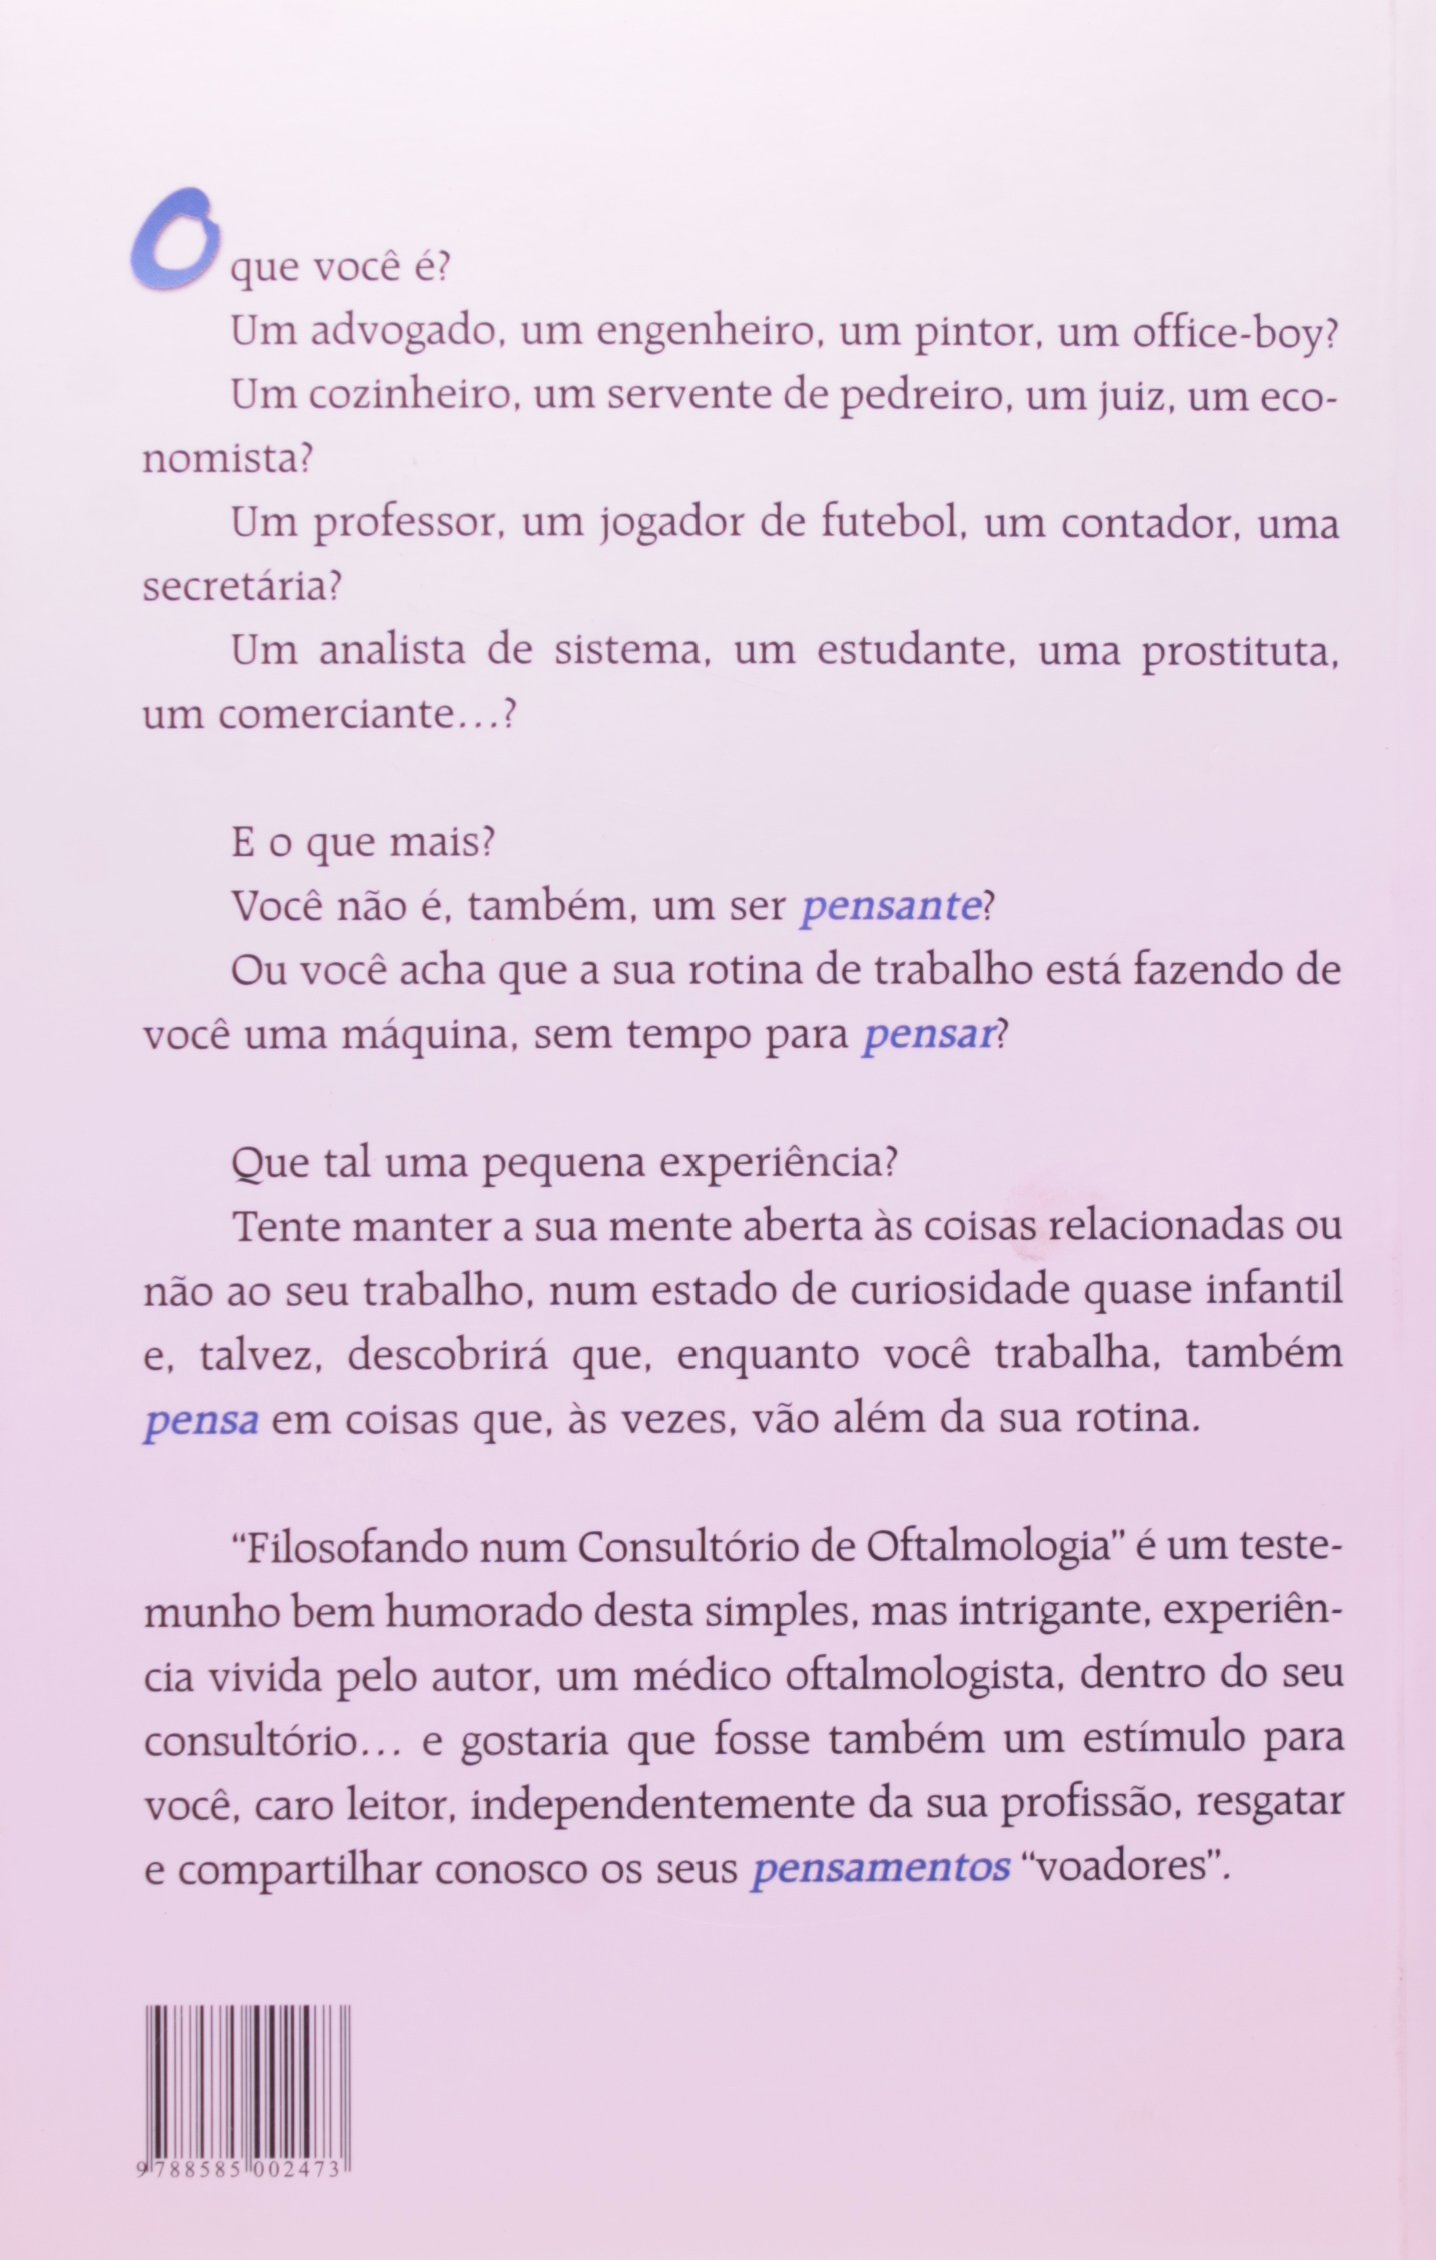 Filosofando Num Consultorio de Oftalmologia: Ivan Thomas Large: 9788585002473: Amazon.com: Books